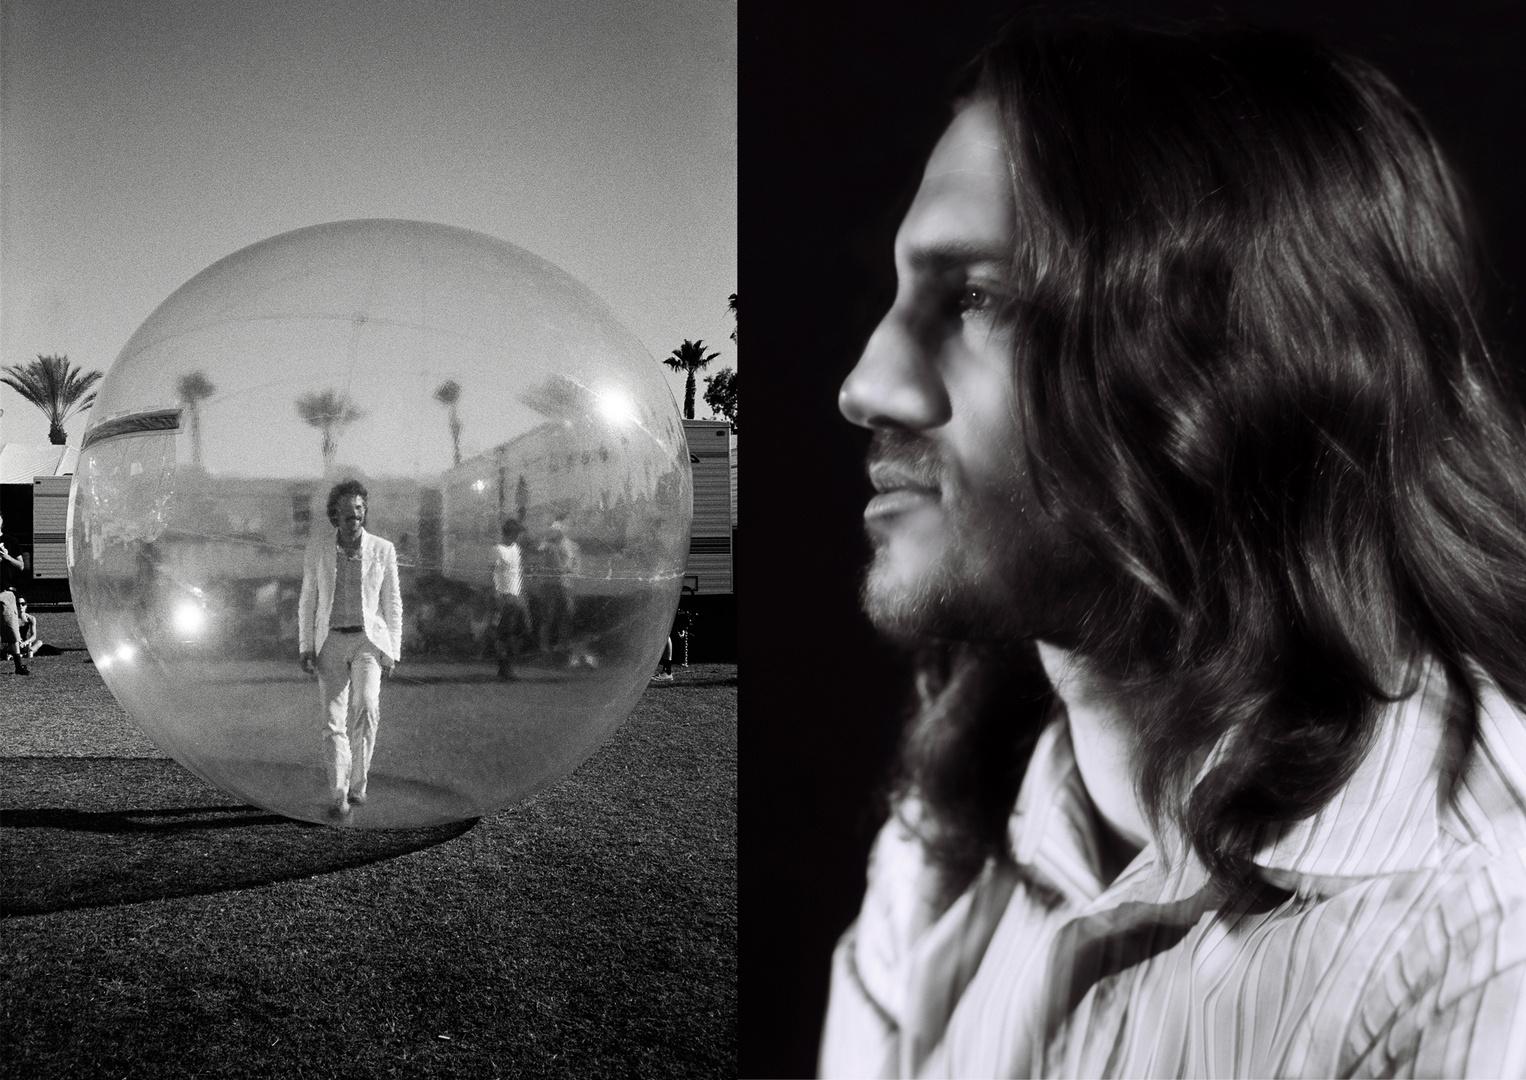 Wayne Coyne Flaming Lips / John Frusciante RHCP